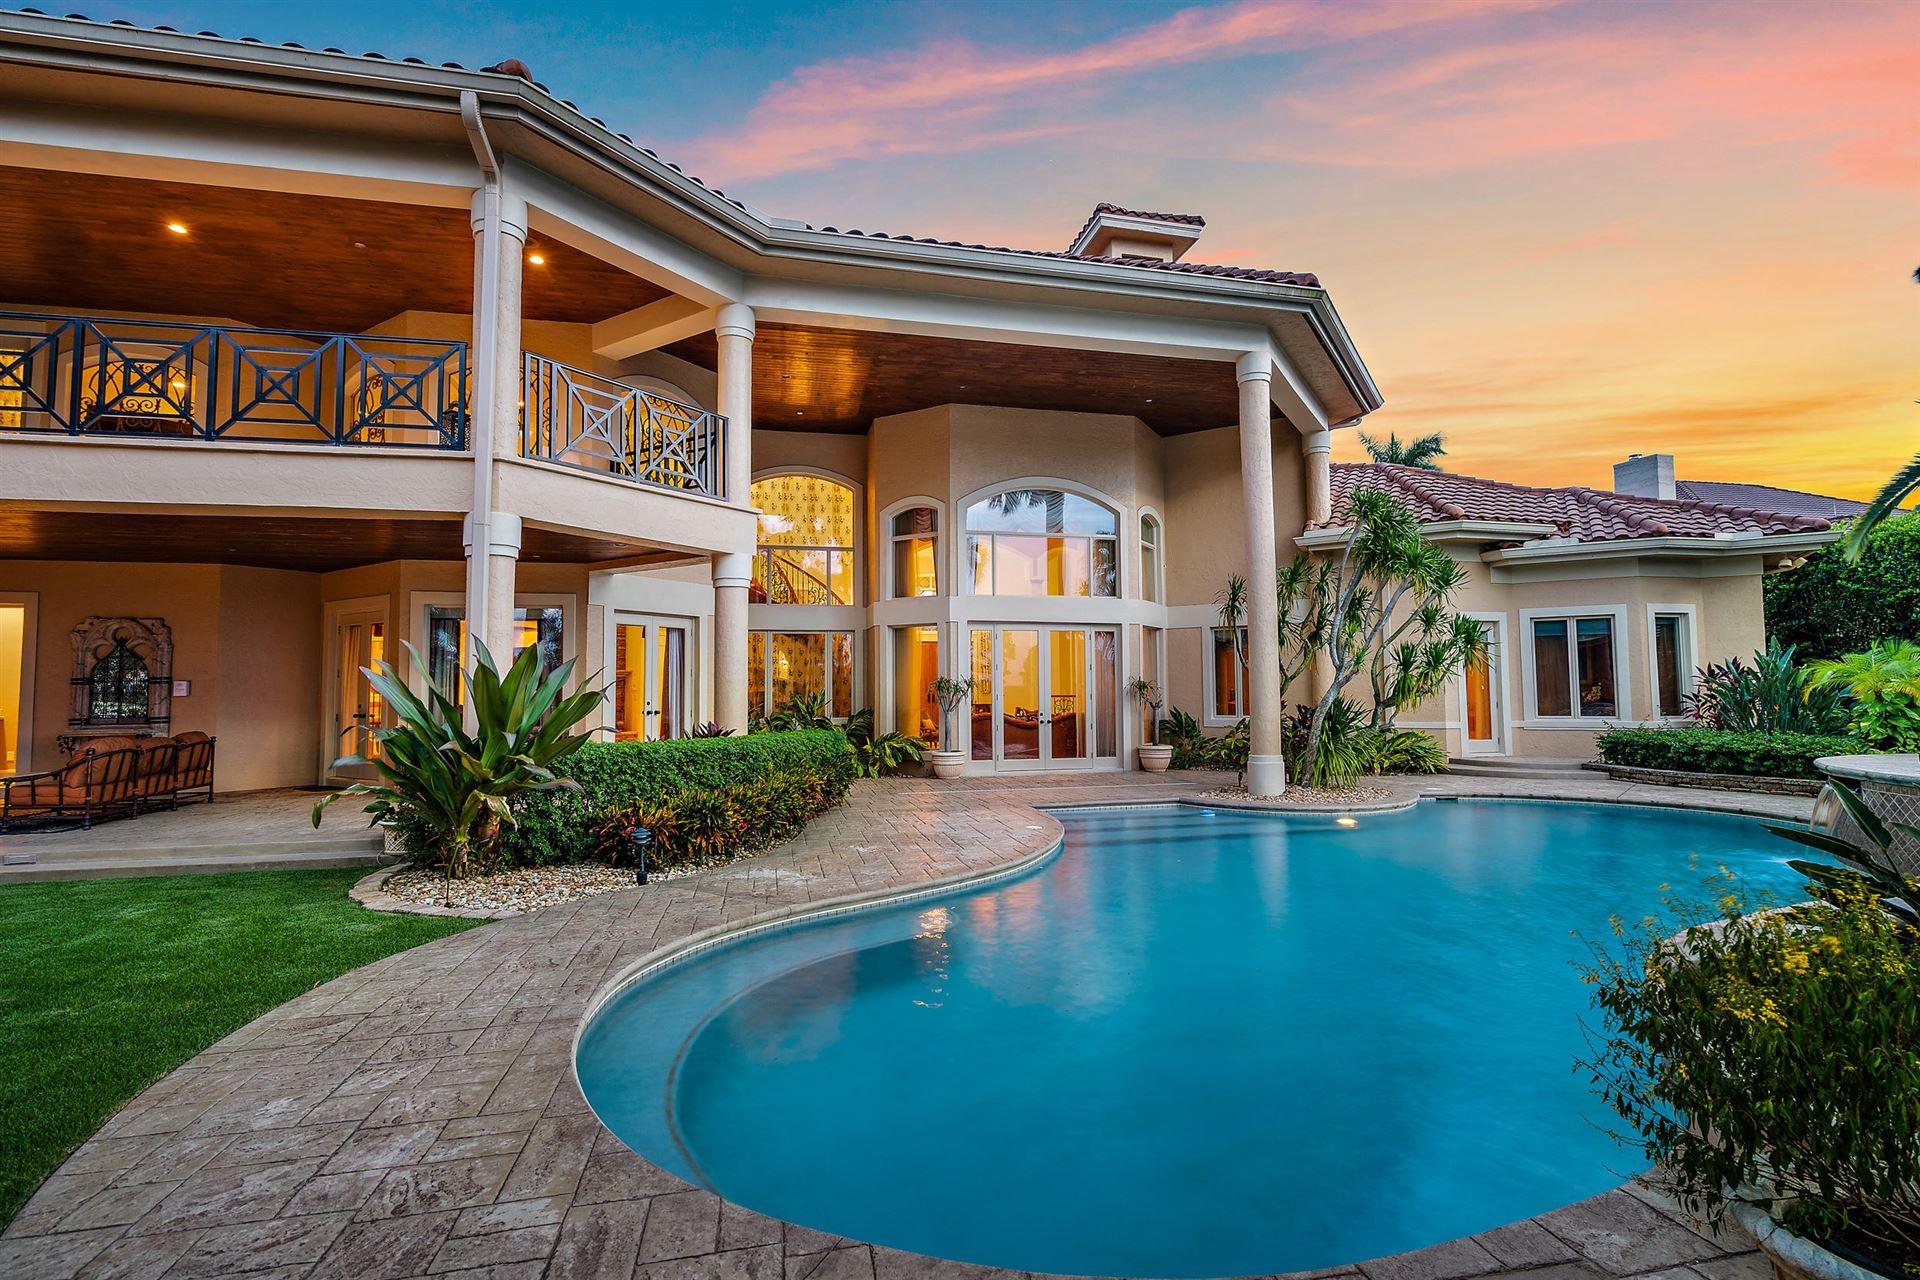 Photo of 00 Saint Thomas Drive, Palm Beach Gardens, FL 33418 (MLS # RX-10657920)